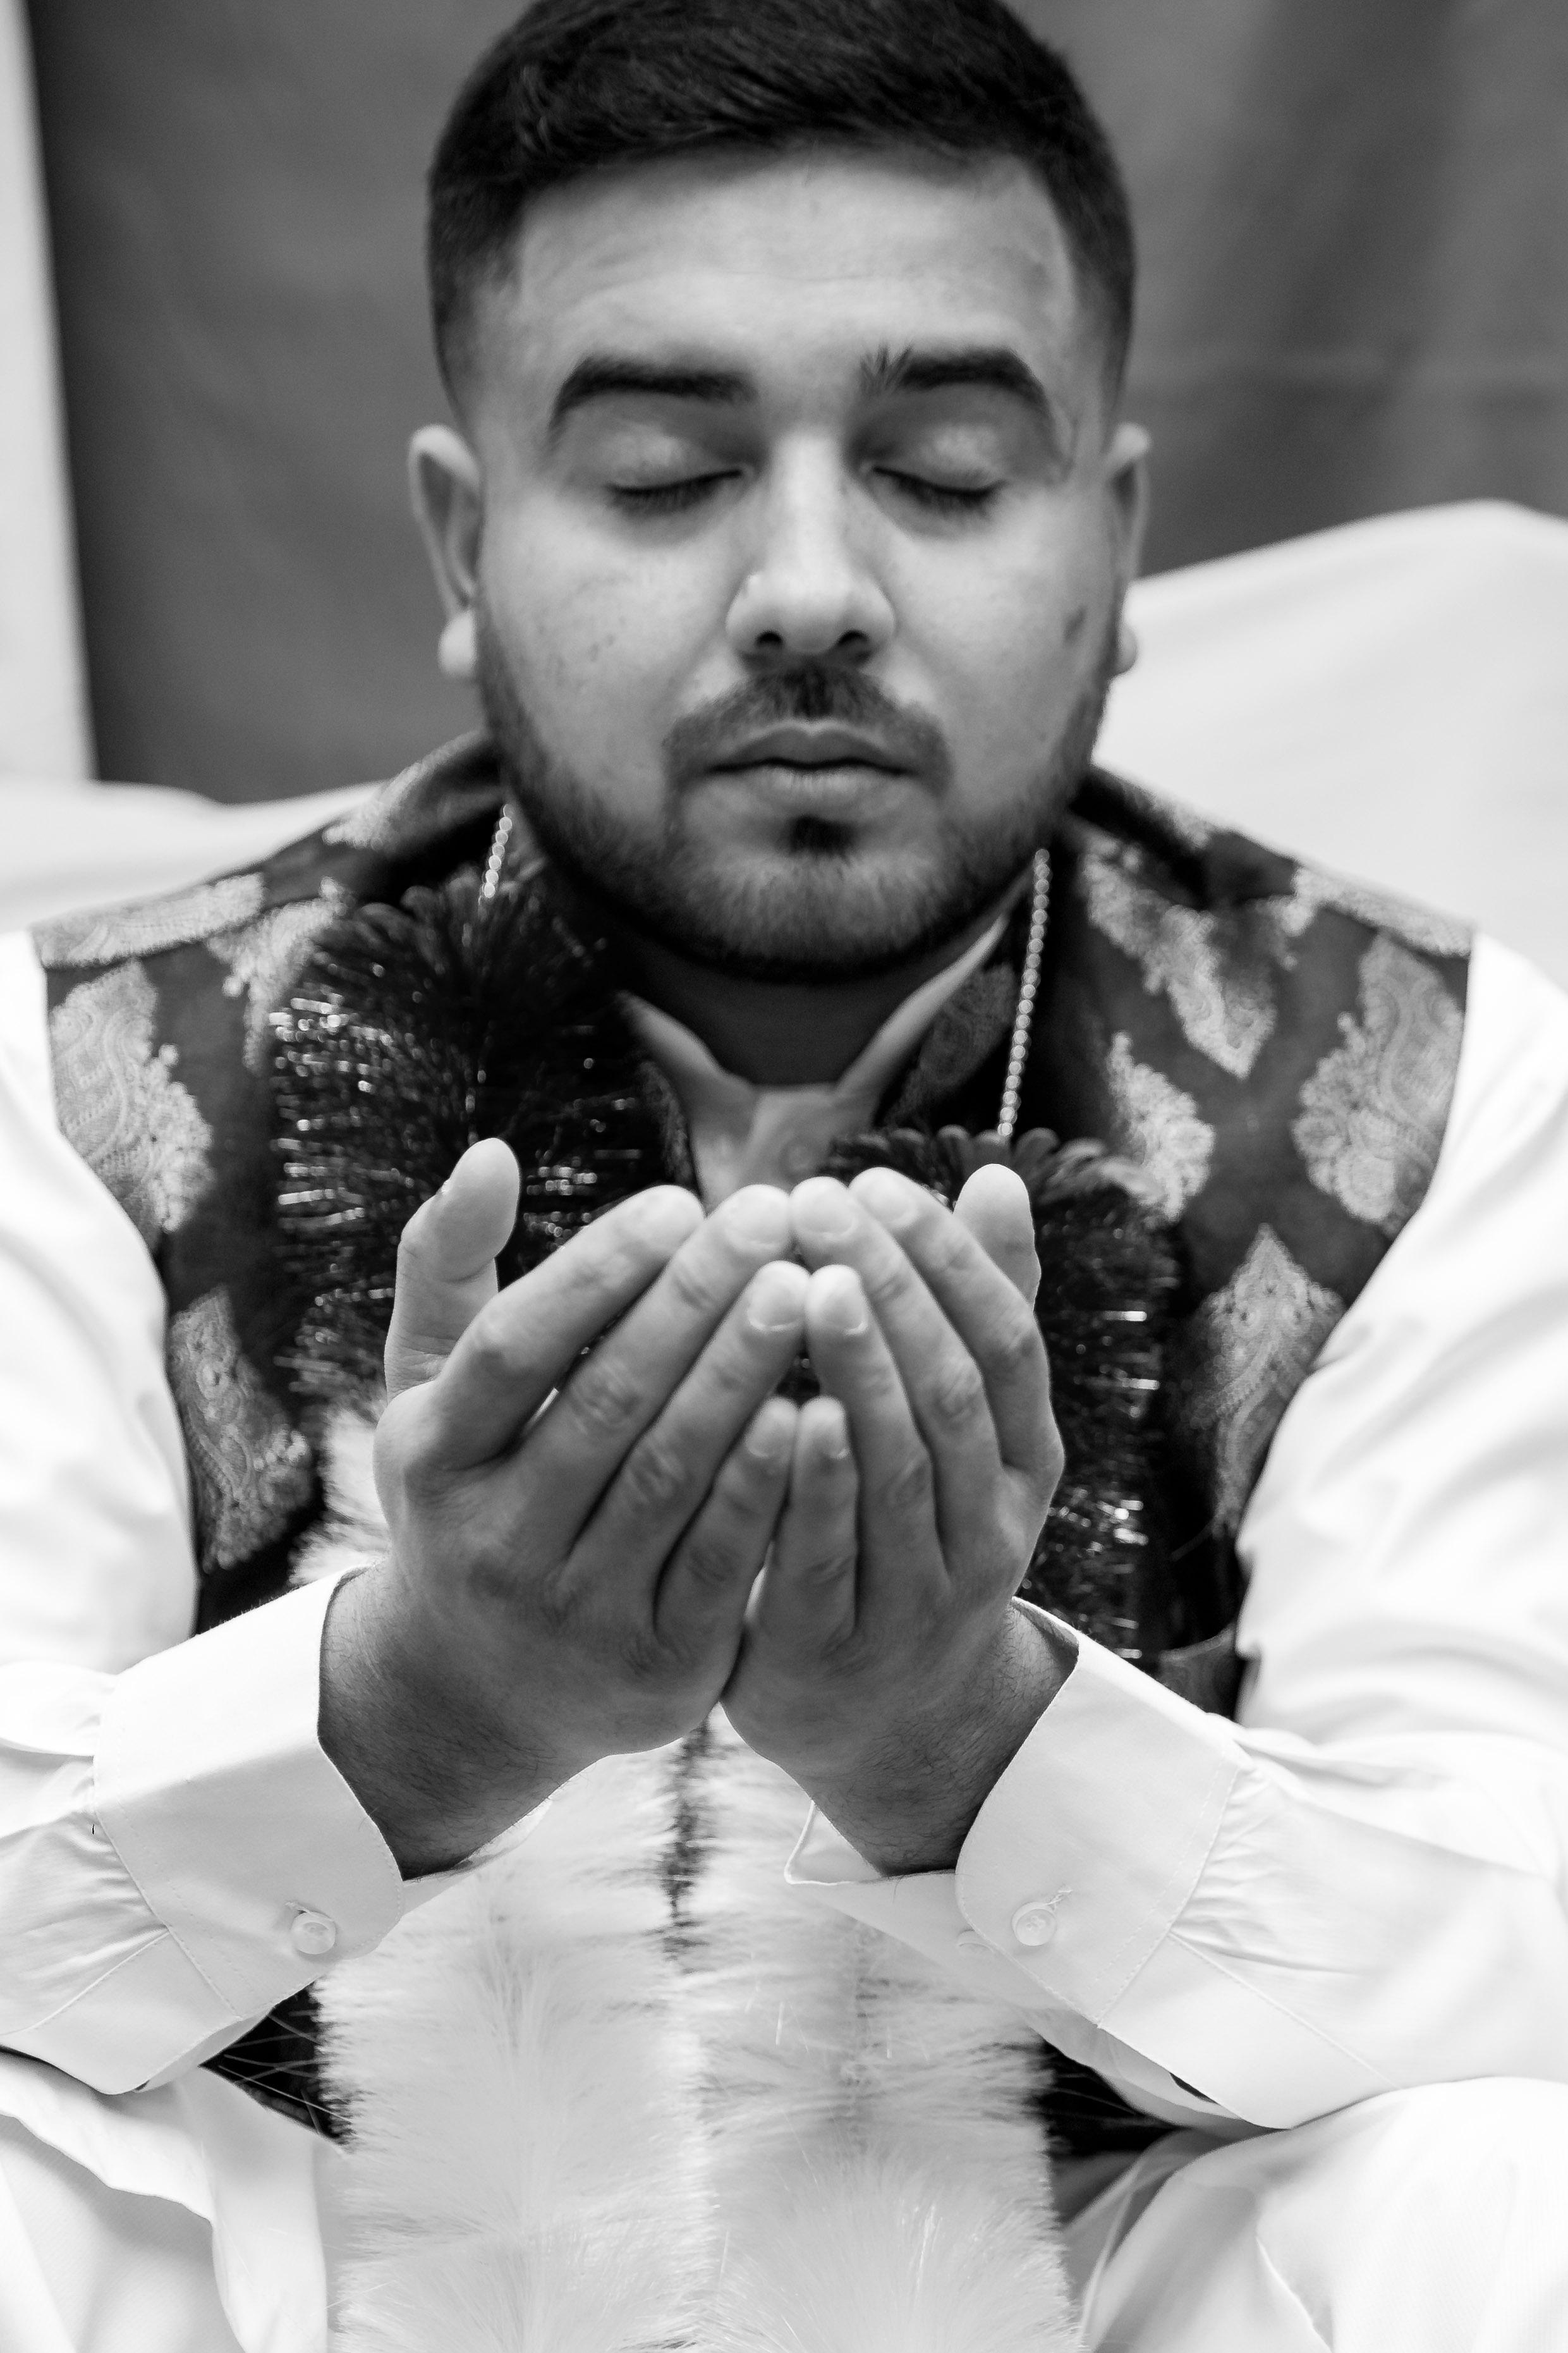 pakistani-wedding-photographer-brooklyn-new-york-13.jpg